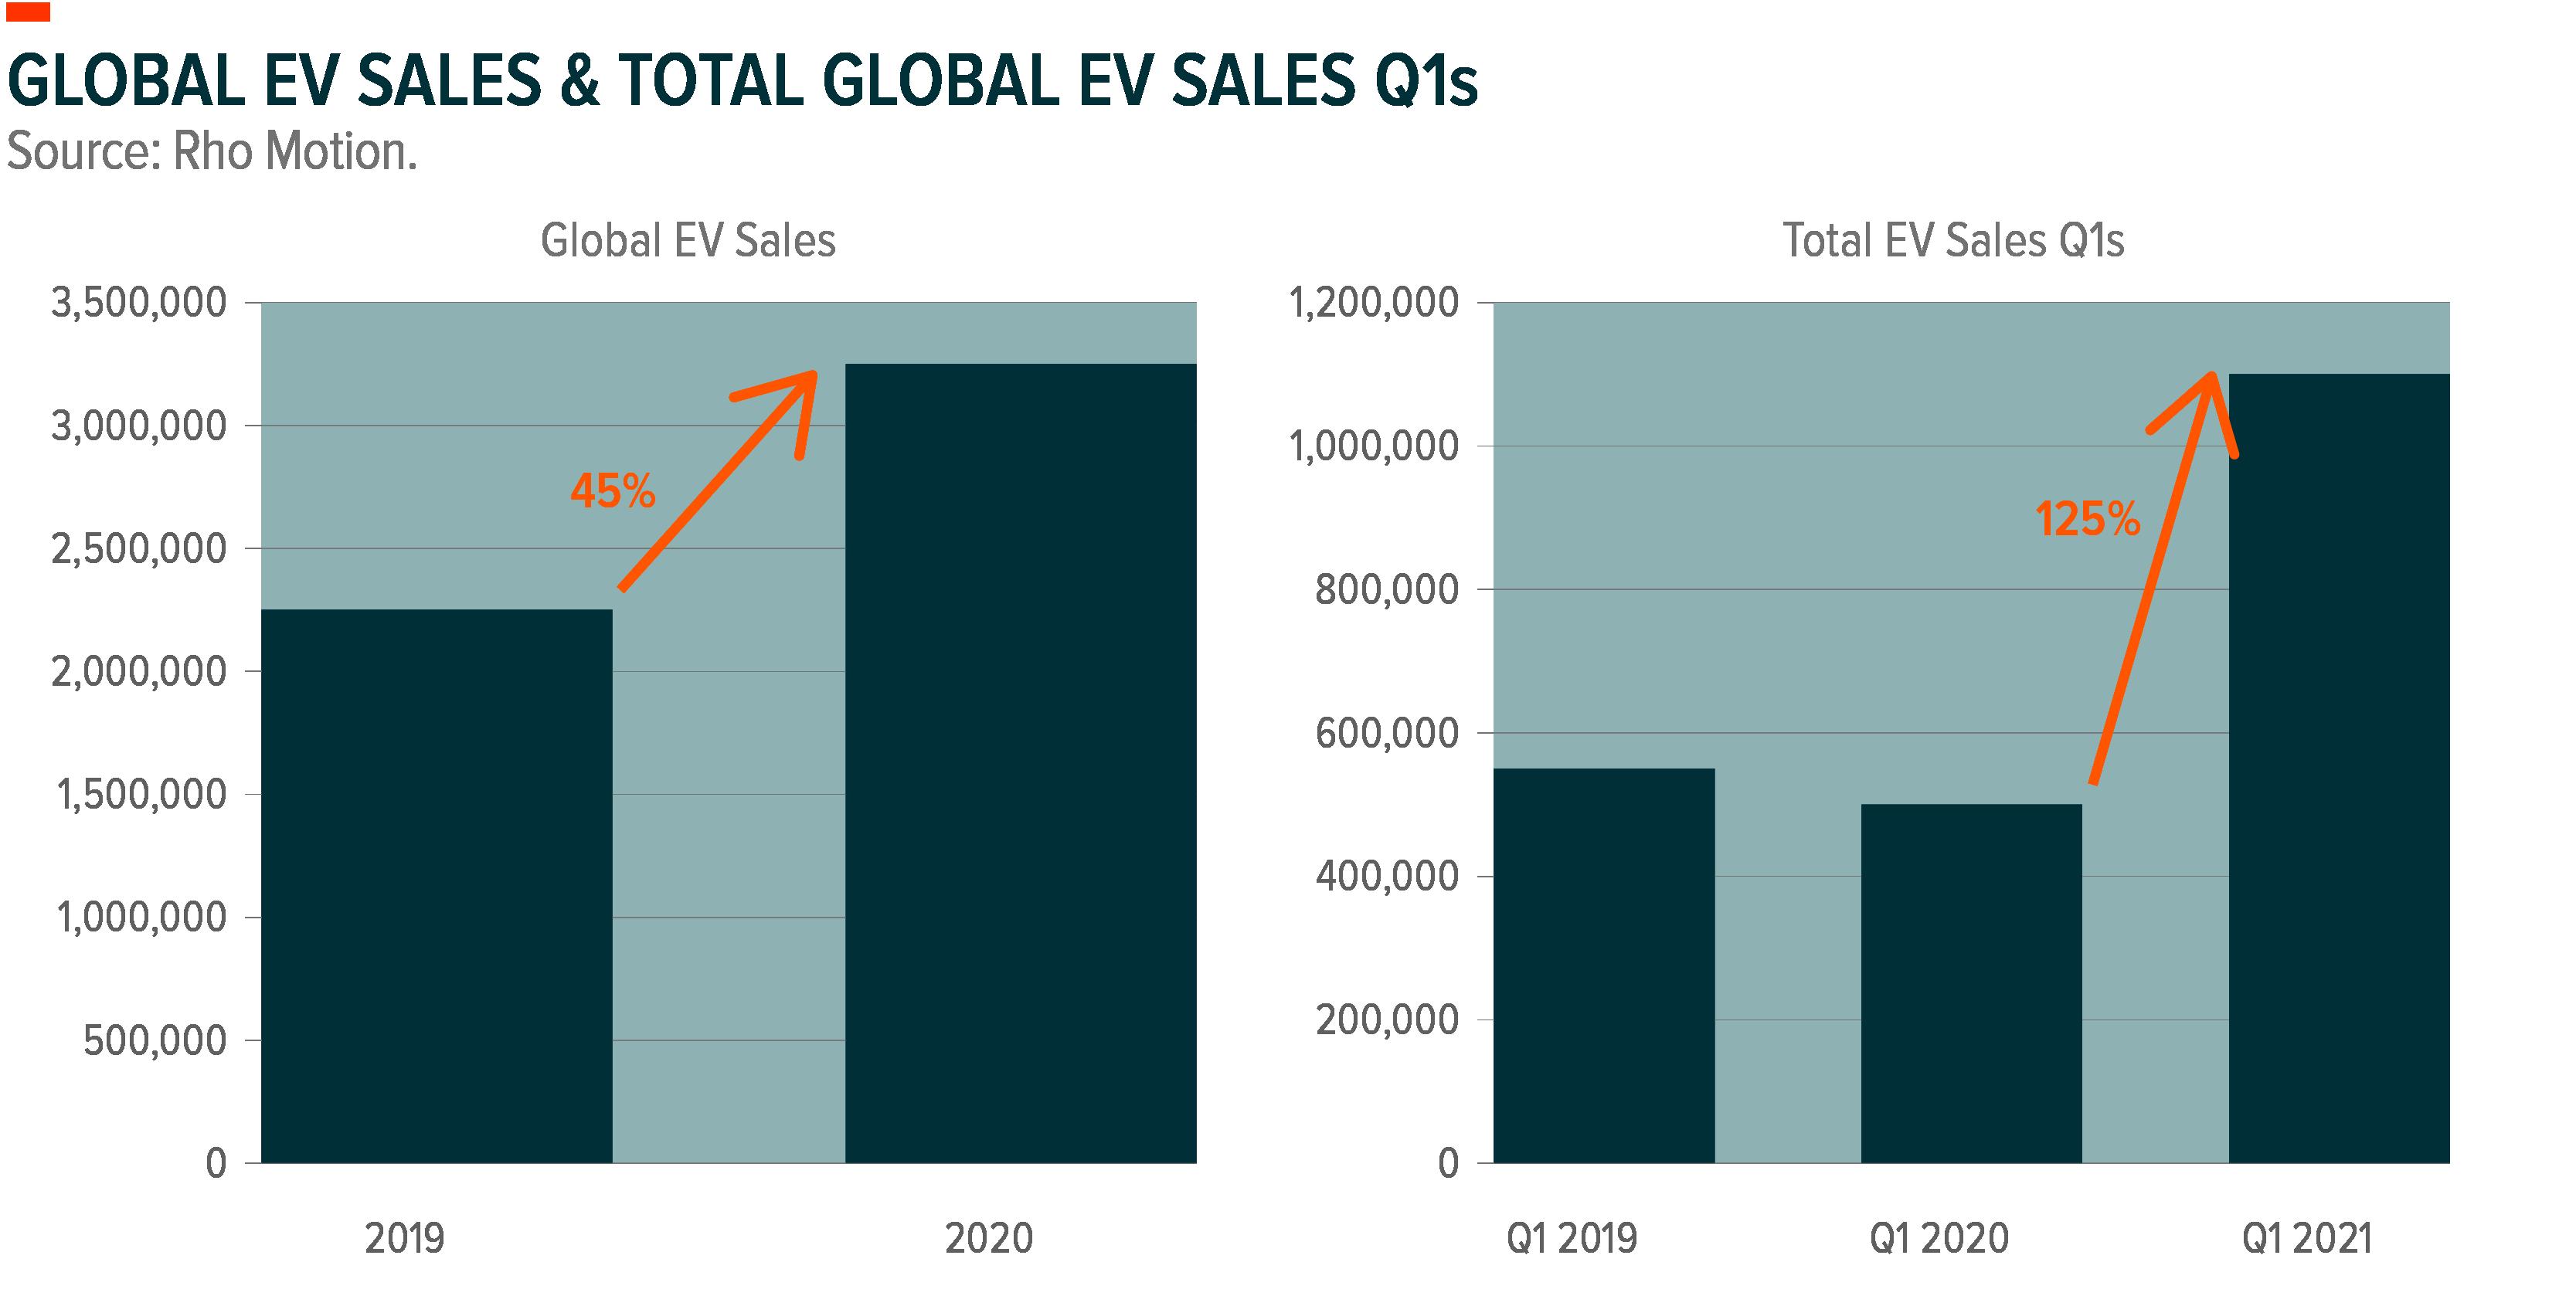 Global EV Sales 2020 & Total EV Sales Q1s